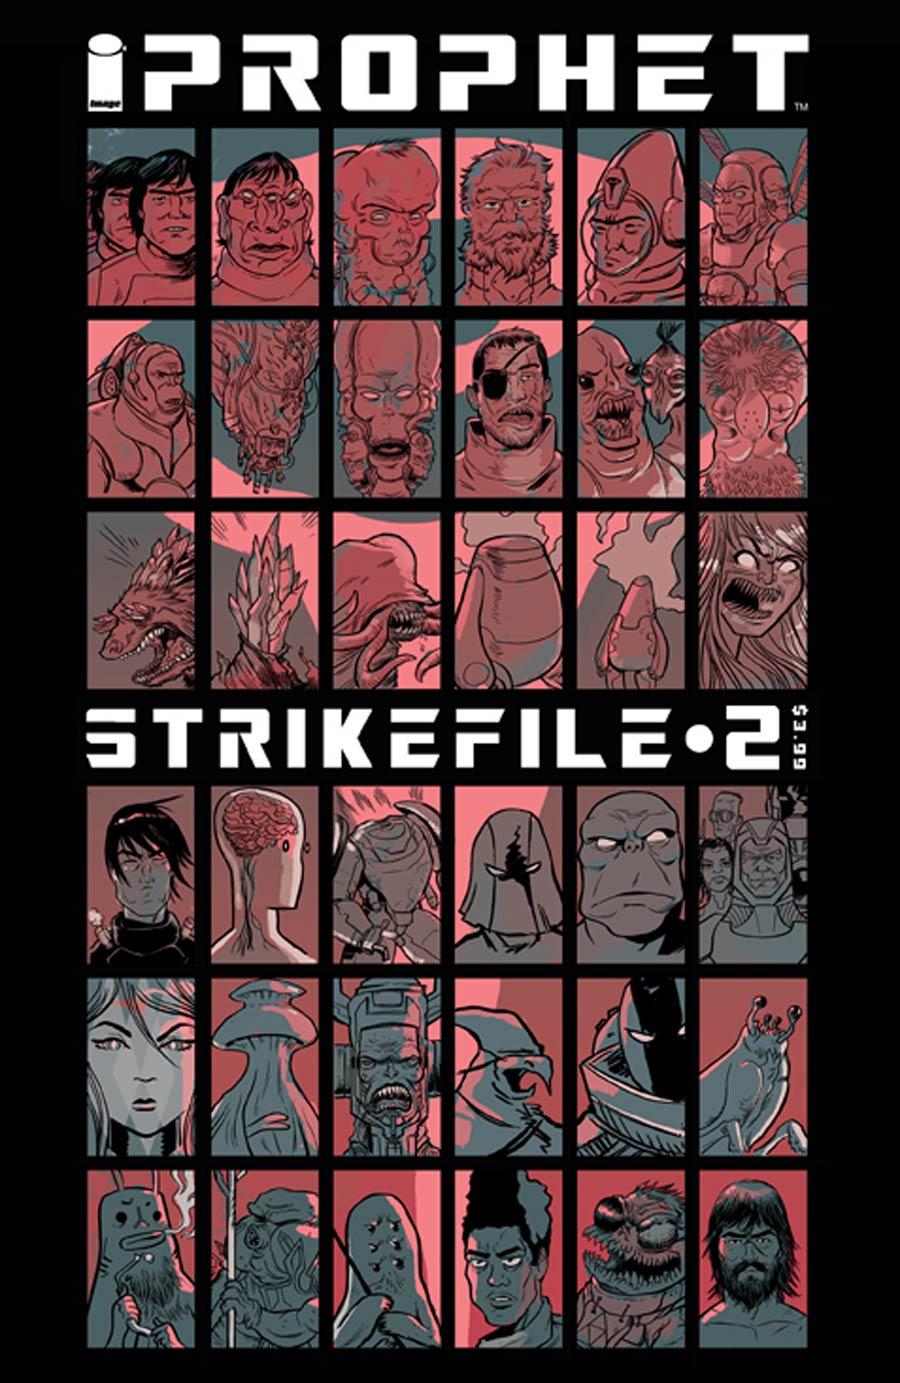 Prophet Strikefile #2